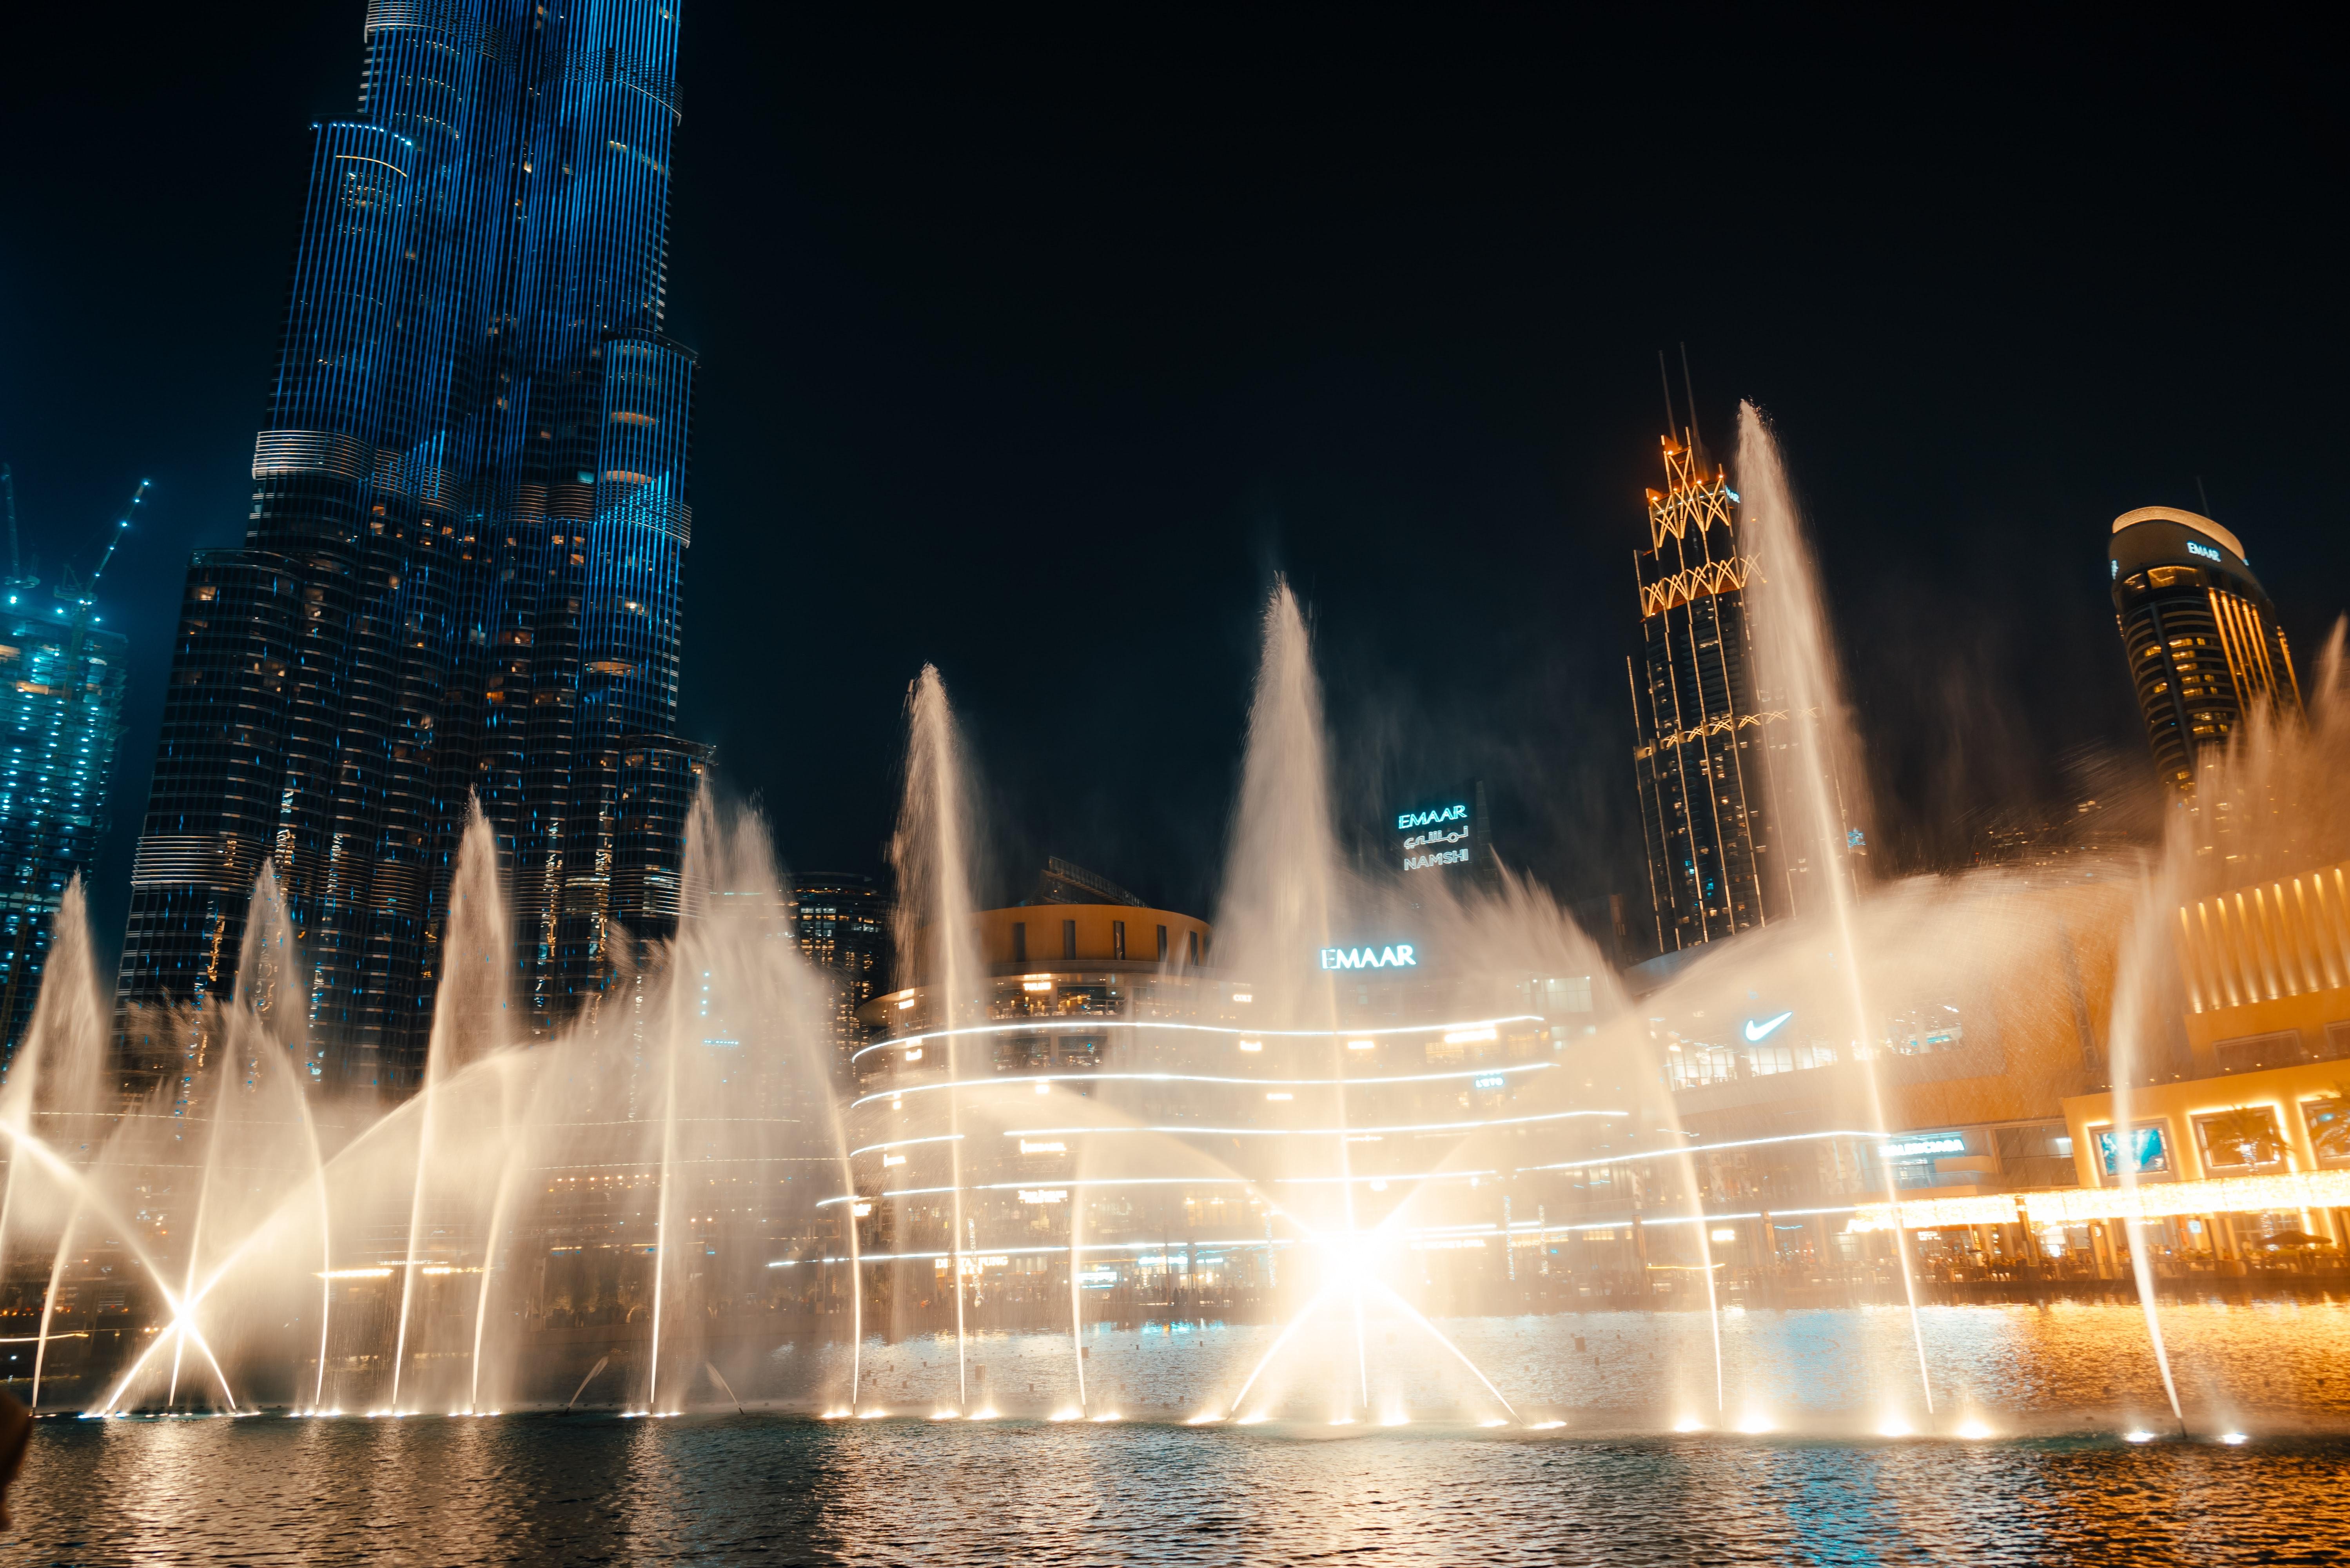 Best Places to Visit in Dubai - Dubai Fountain - 2